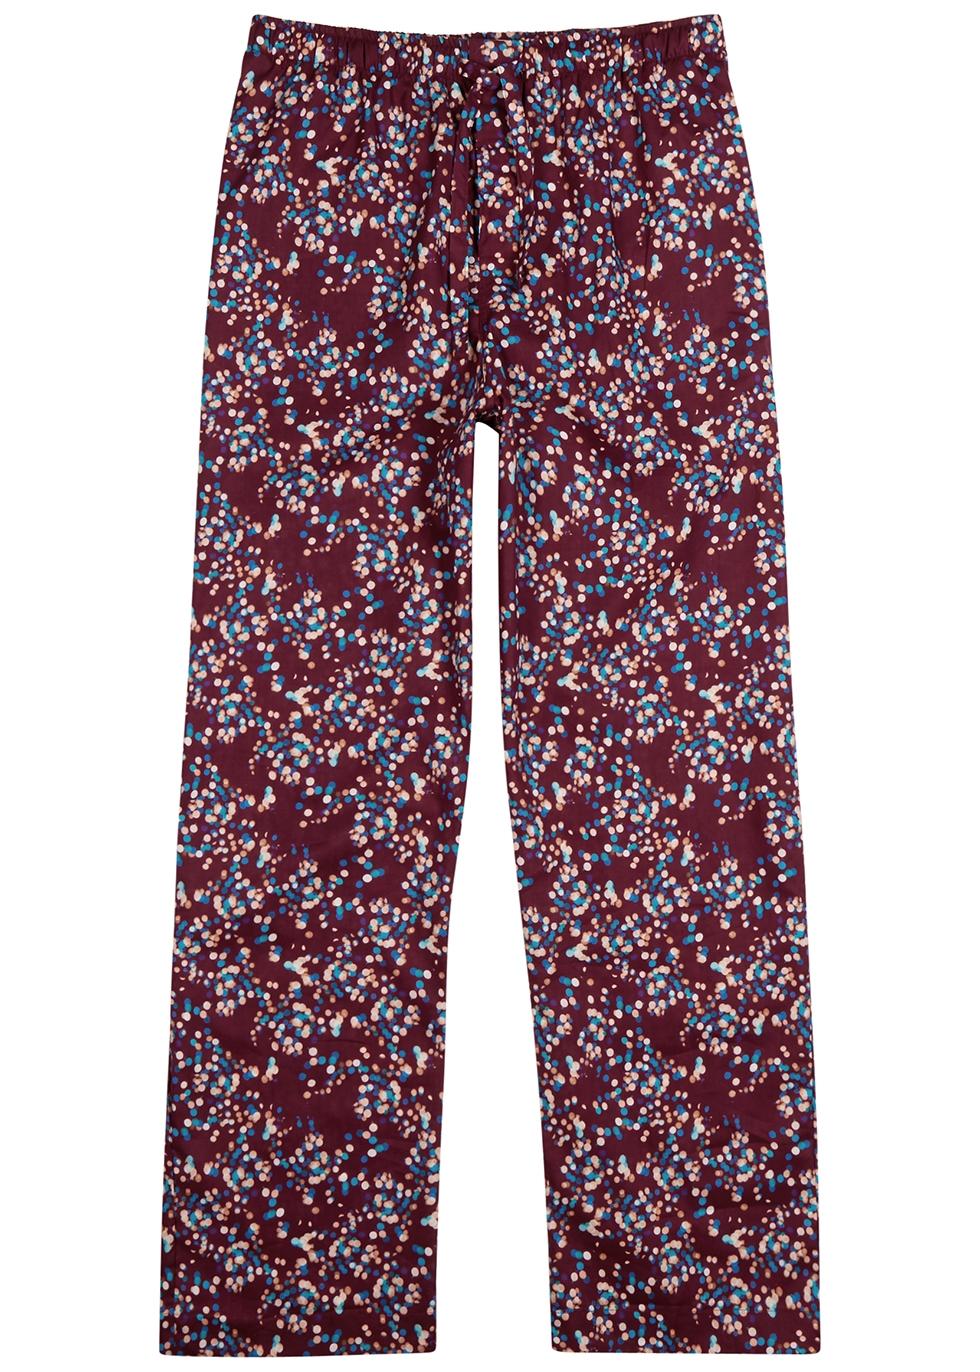 Ledbury 45 burgundy printed cotton pyjama trousers